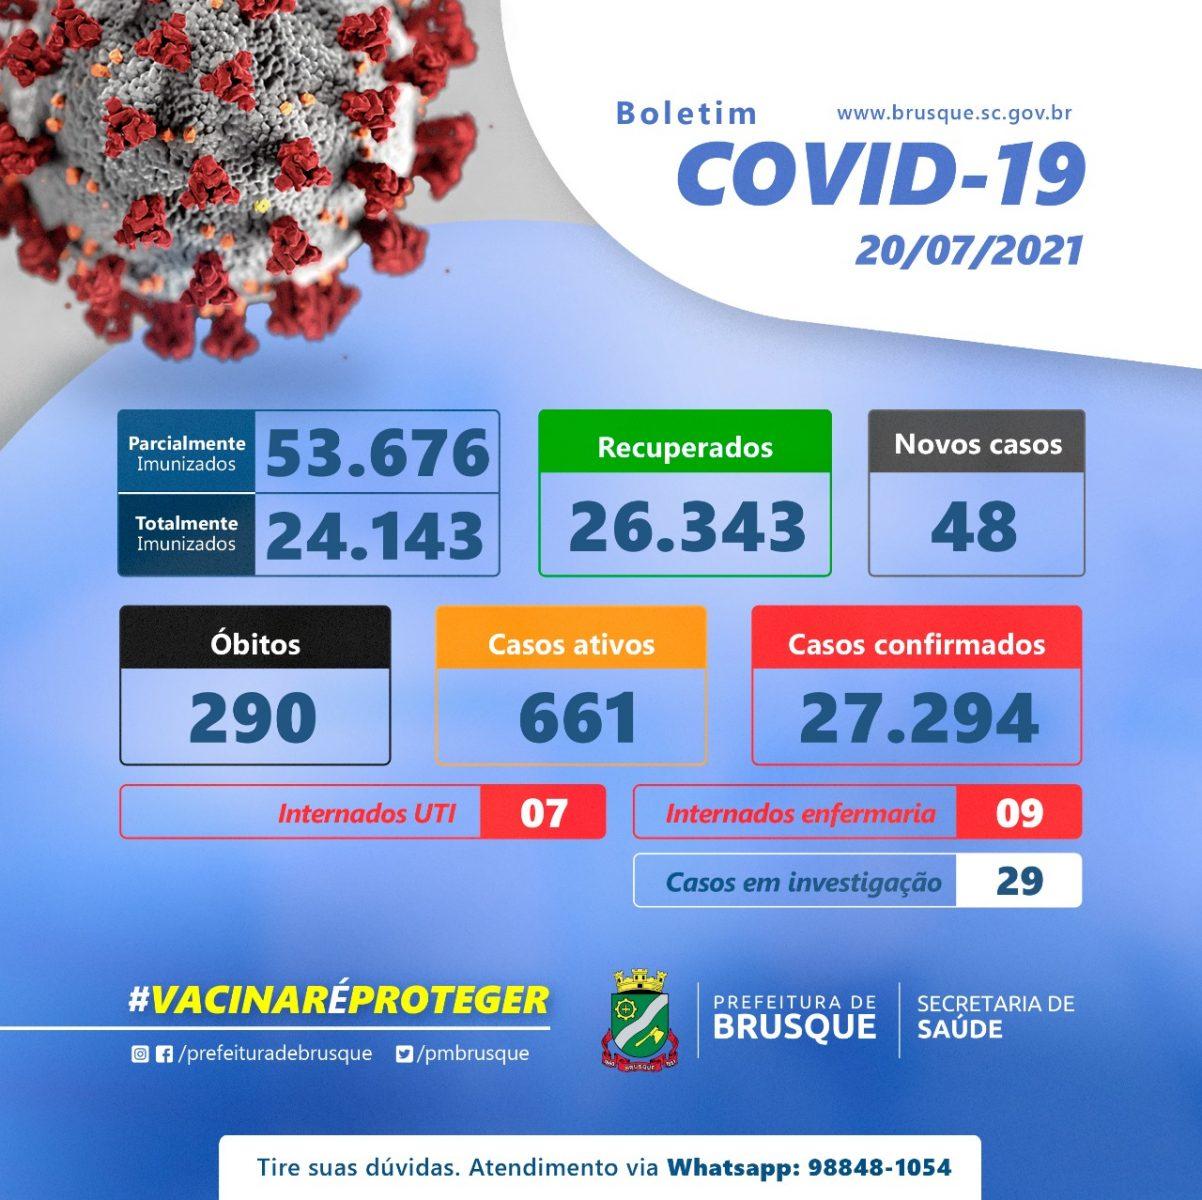 Covid-19: Confira o boletim epidemiológico desta terça-feira (20)